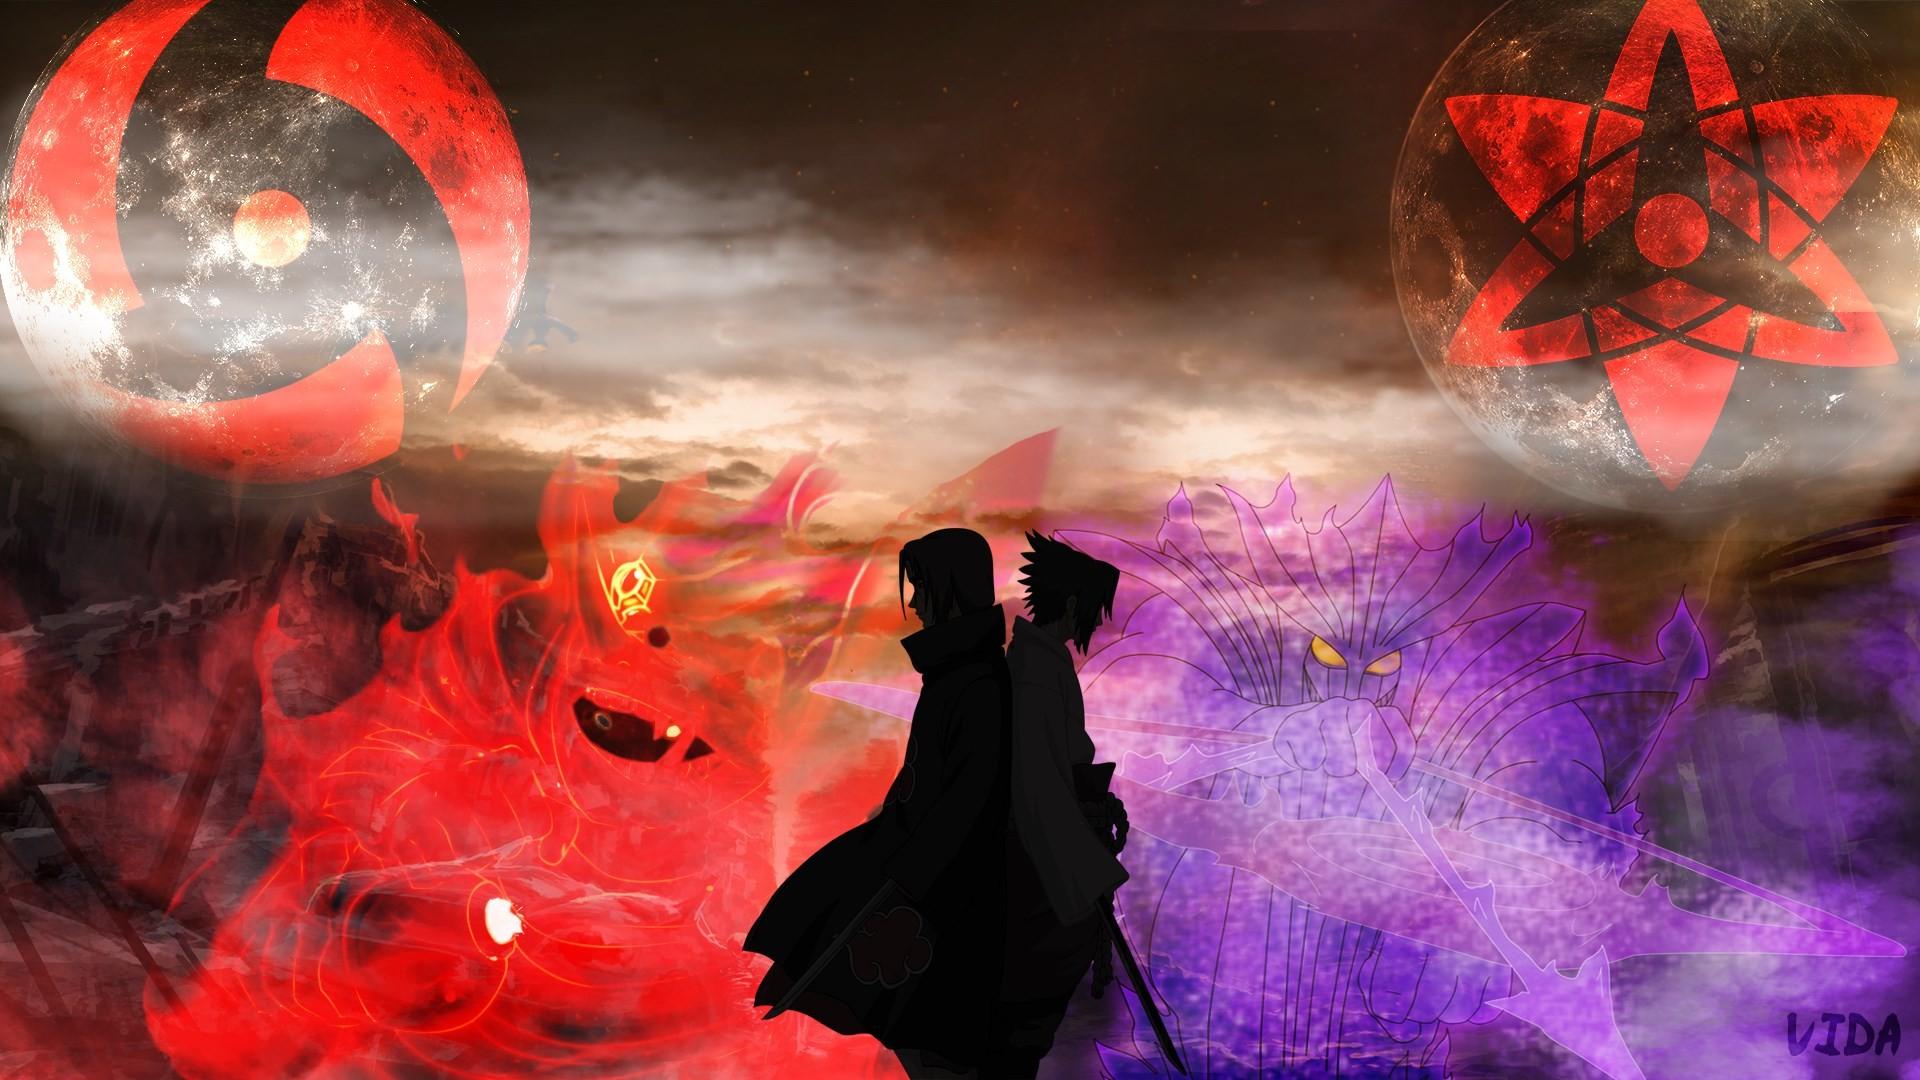 sasuke vs itachi wallpaper hd …